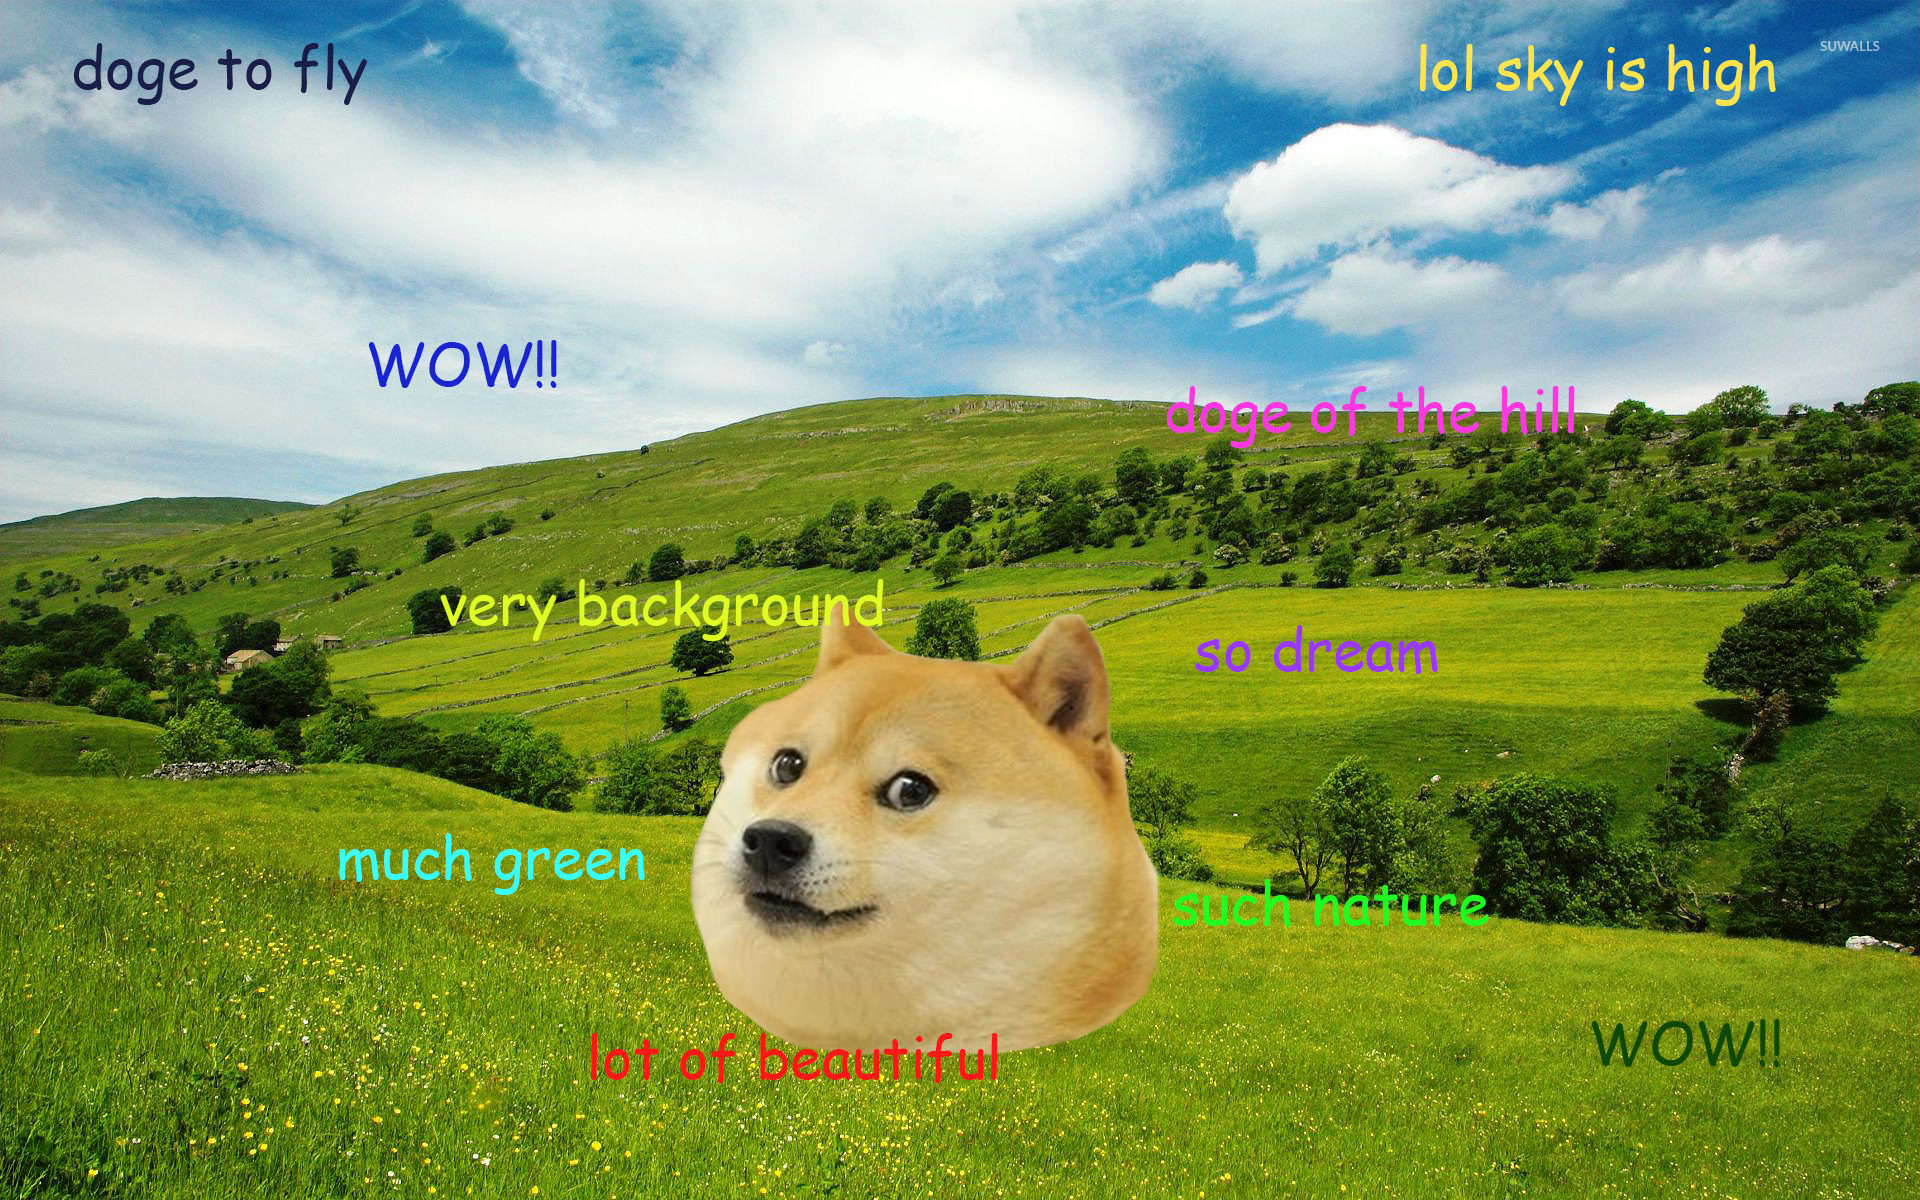 Doge Hd Wallpapers New Tab Meme Theme